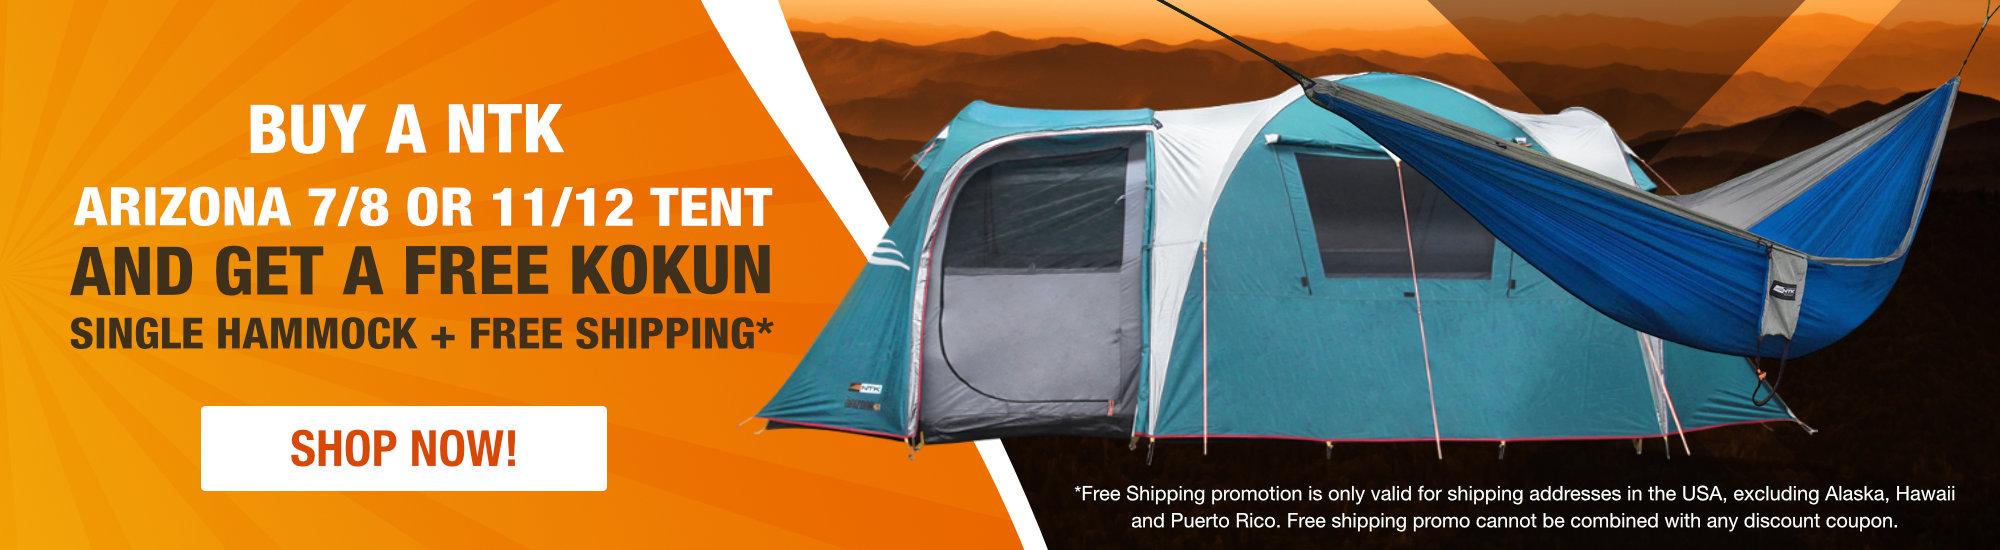 Buy Arizona Tent and Get a free Kokun Single Hammock